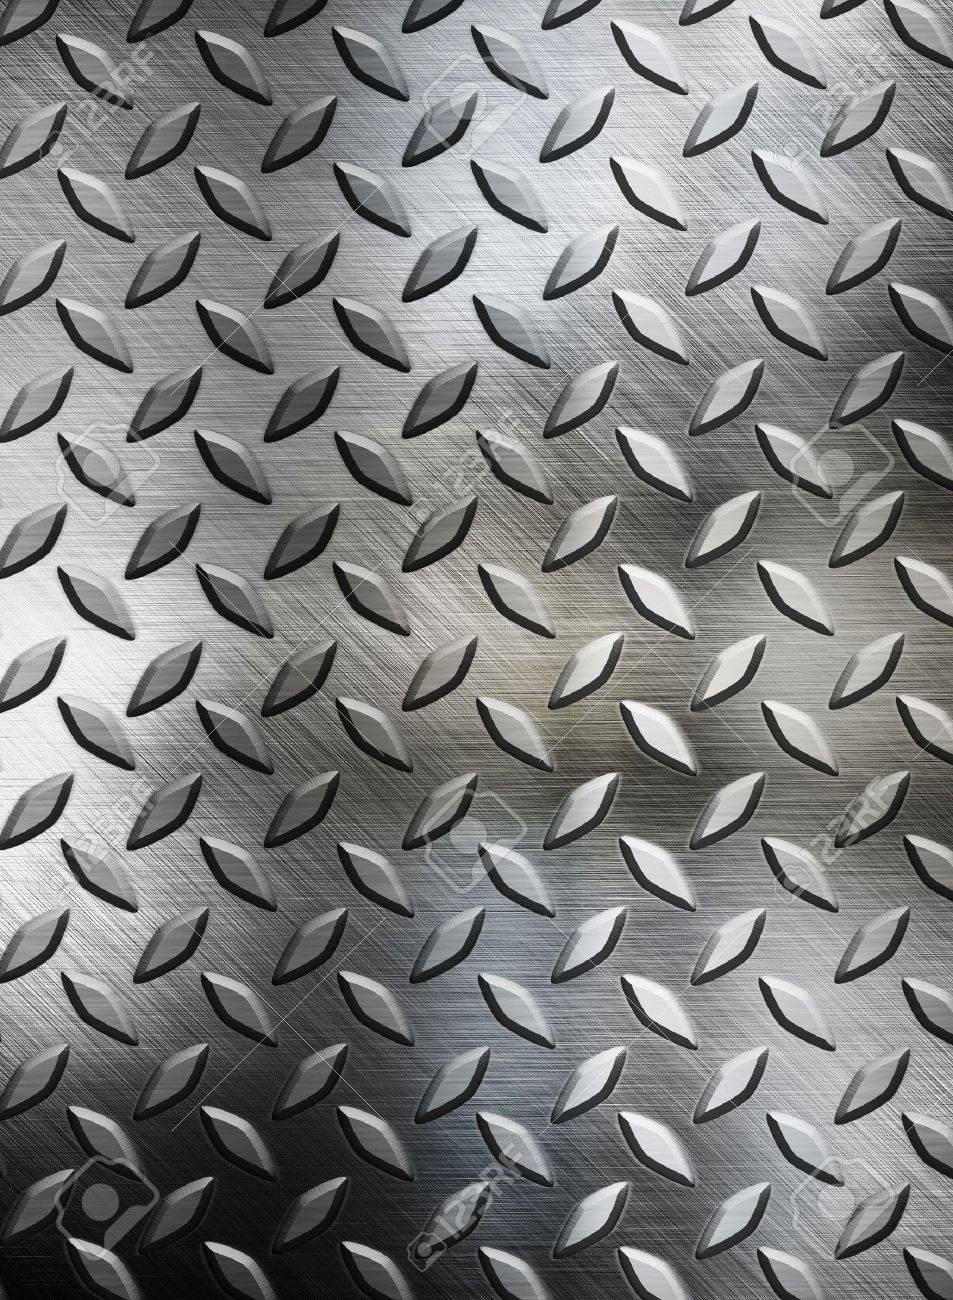 diamont plate metal background Stock Photo - 12691456